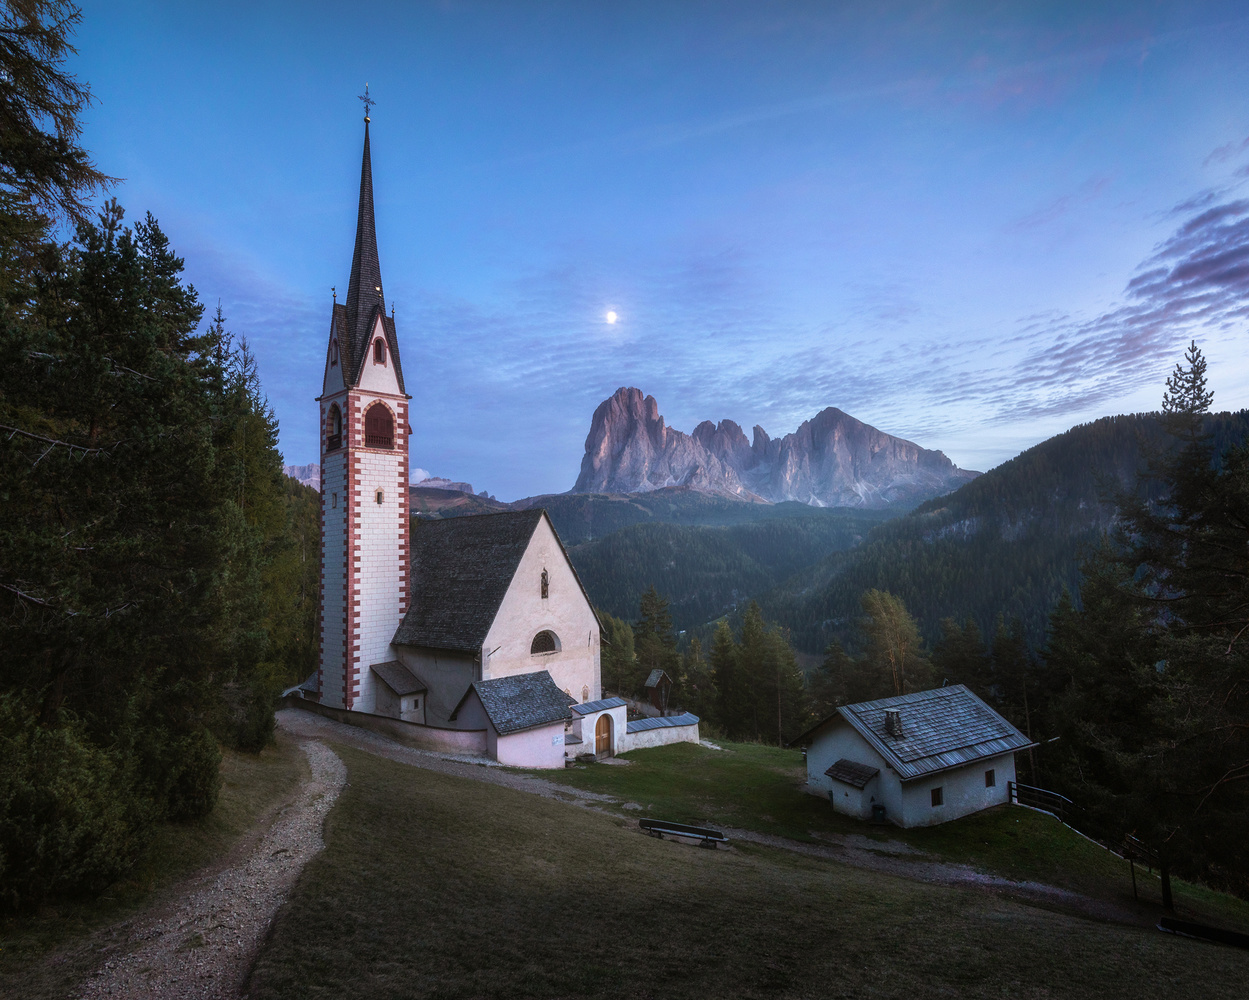 St. Jacob's church by Philip Slotte